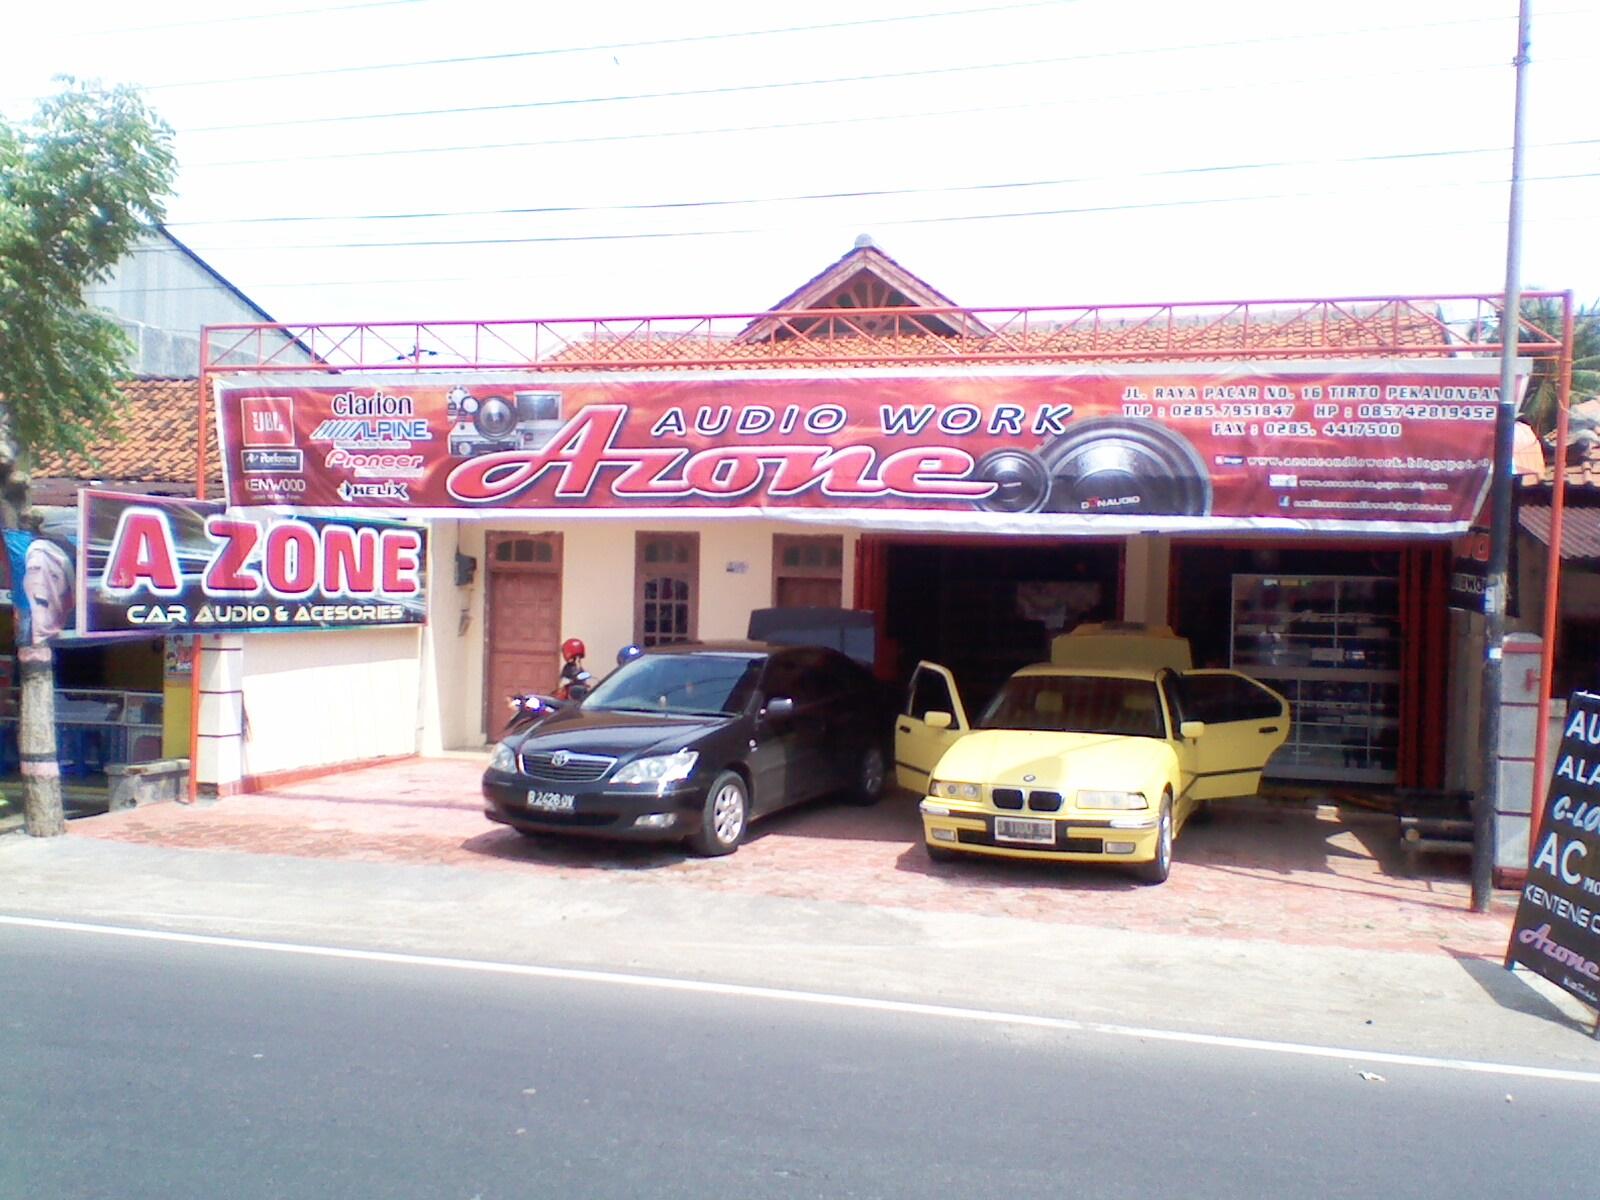 Azone Audioworks